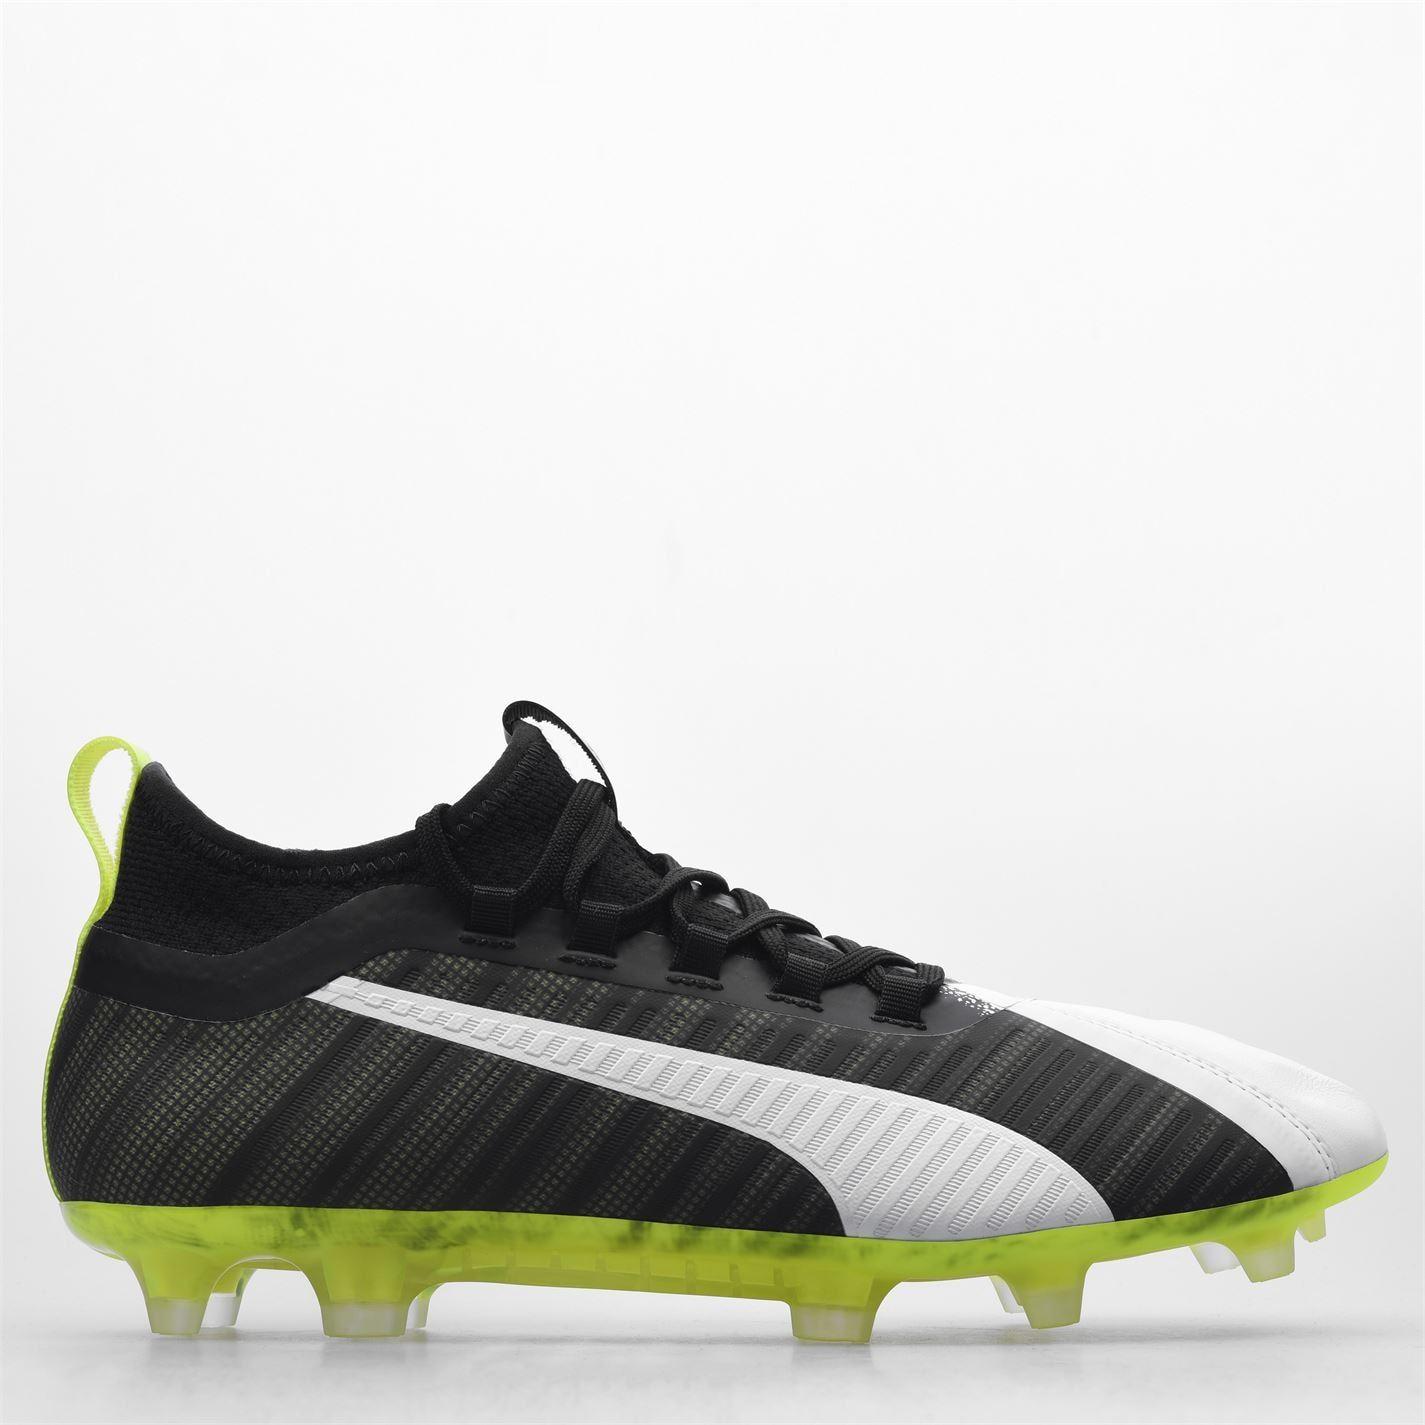 miniature 9 - Puma-5-2-FG-Firm-Ground-Football-Bottes-Homme-Chaussures-De-Foot-Crampons-Baskets